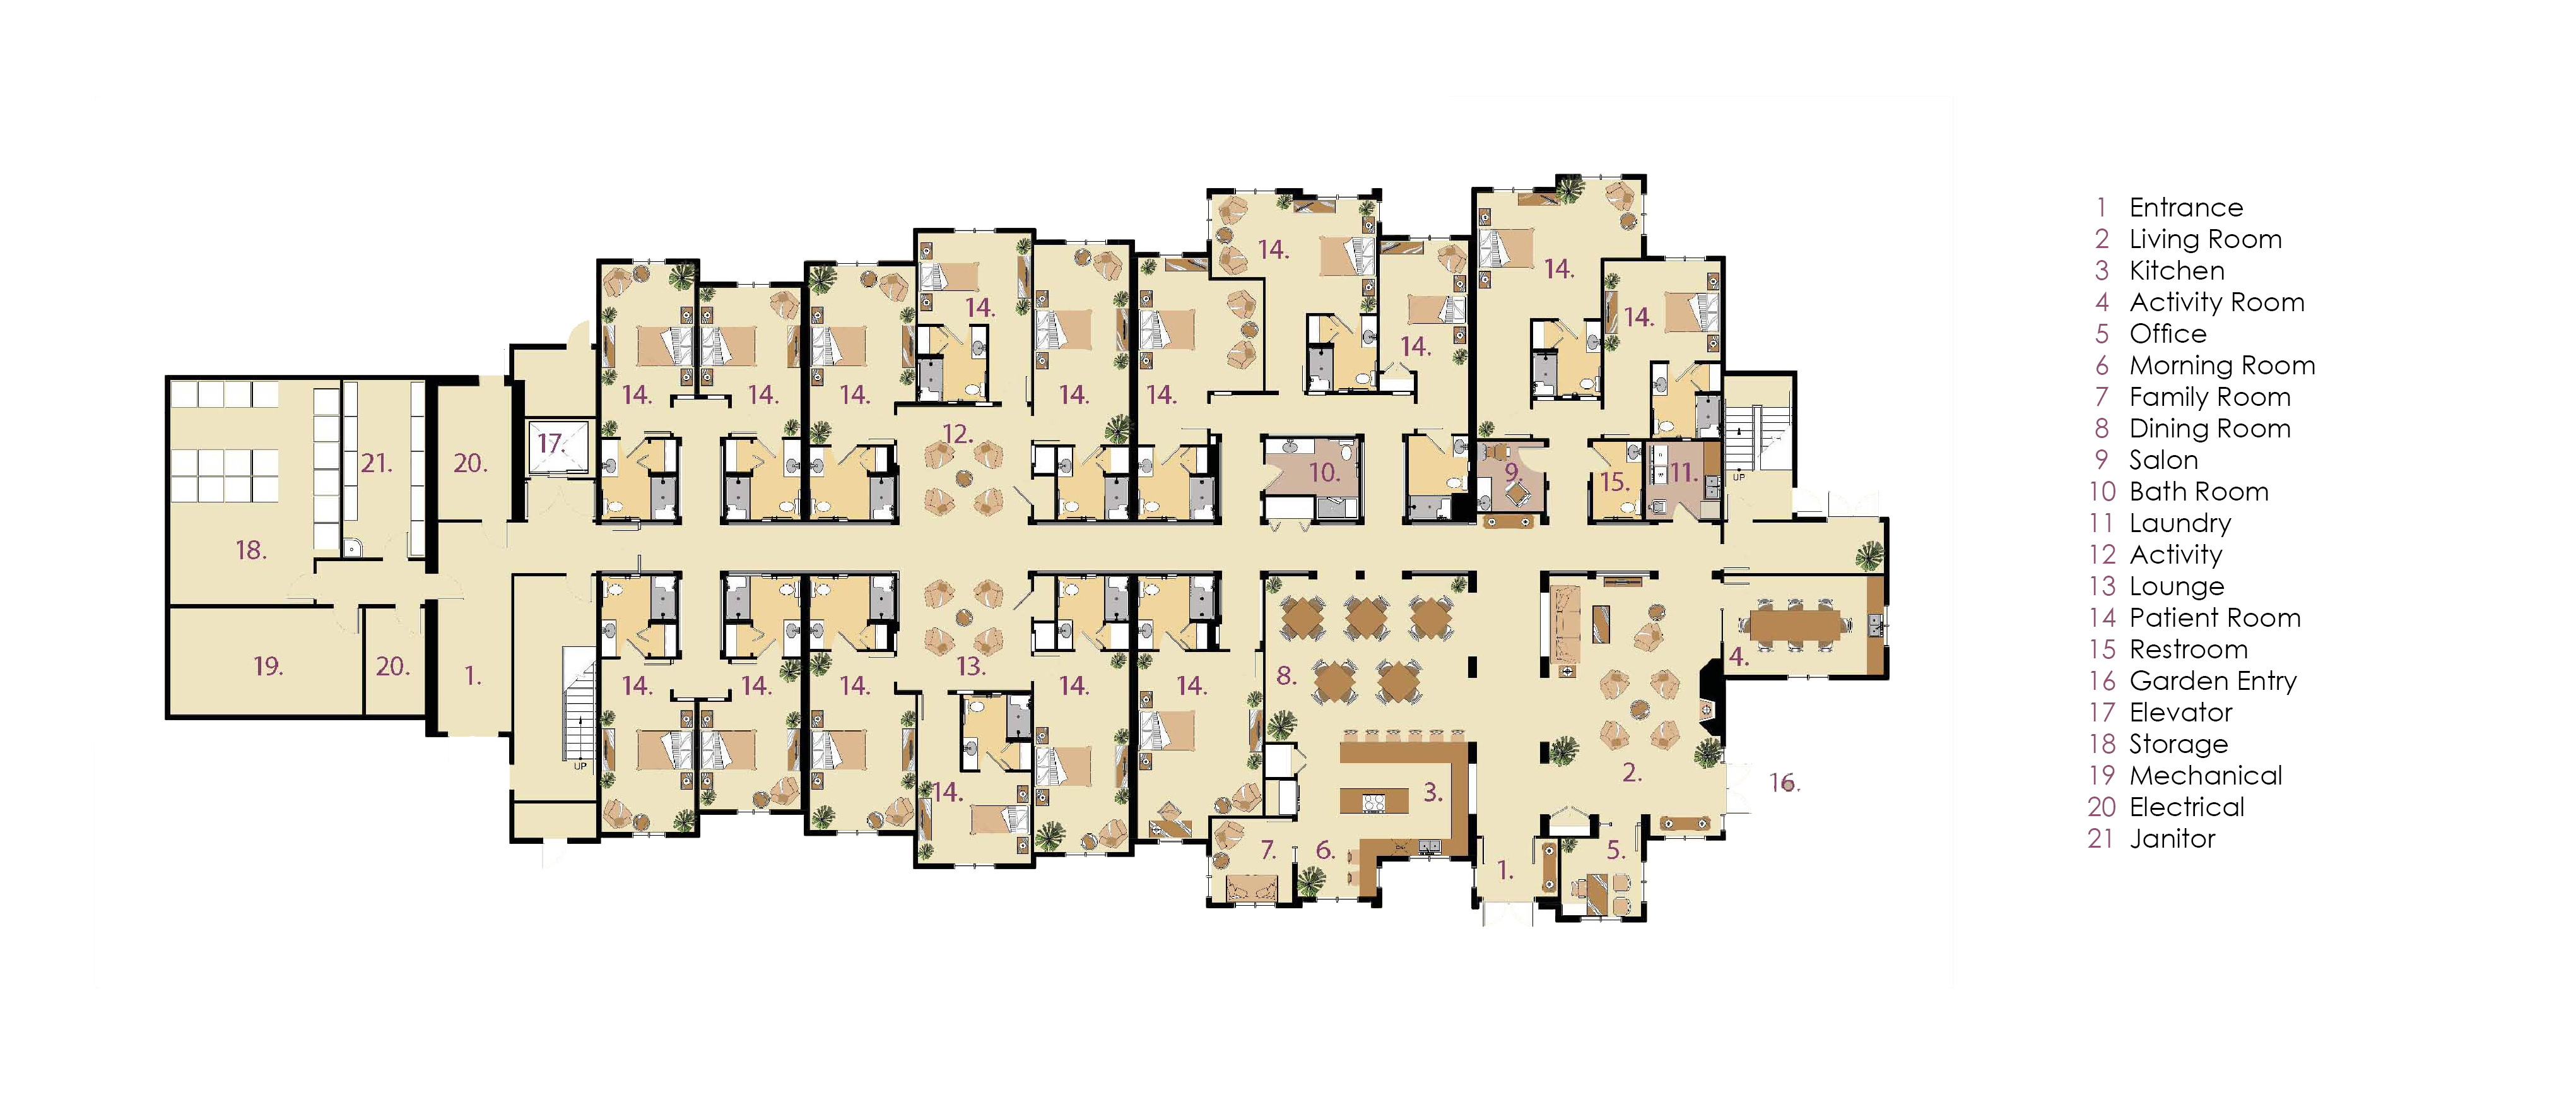 Las Ventanas Memory Care Suites